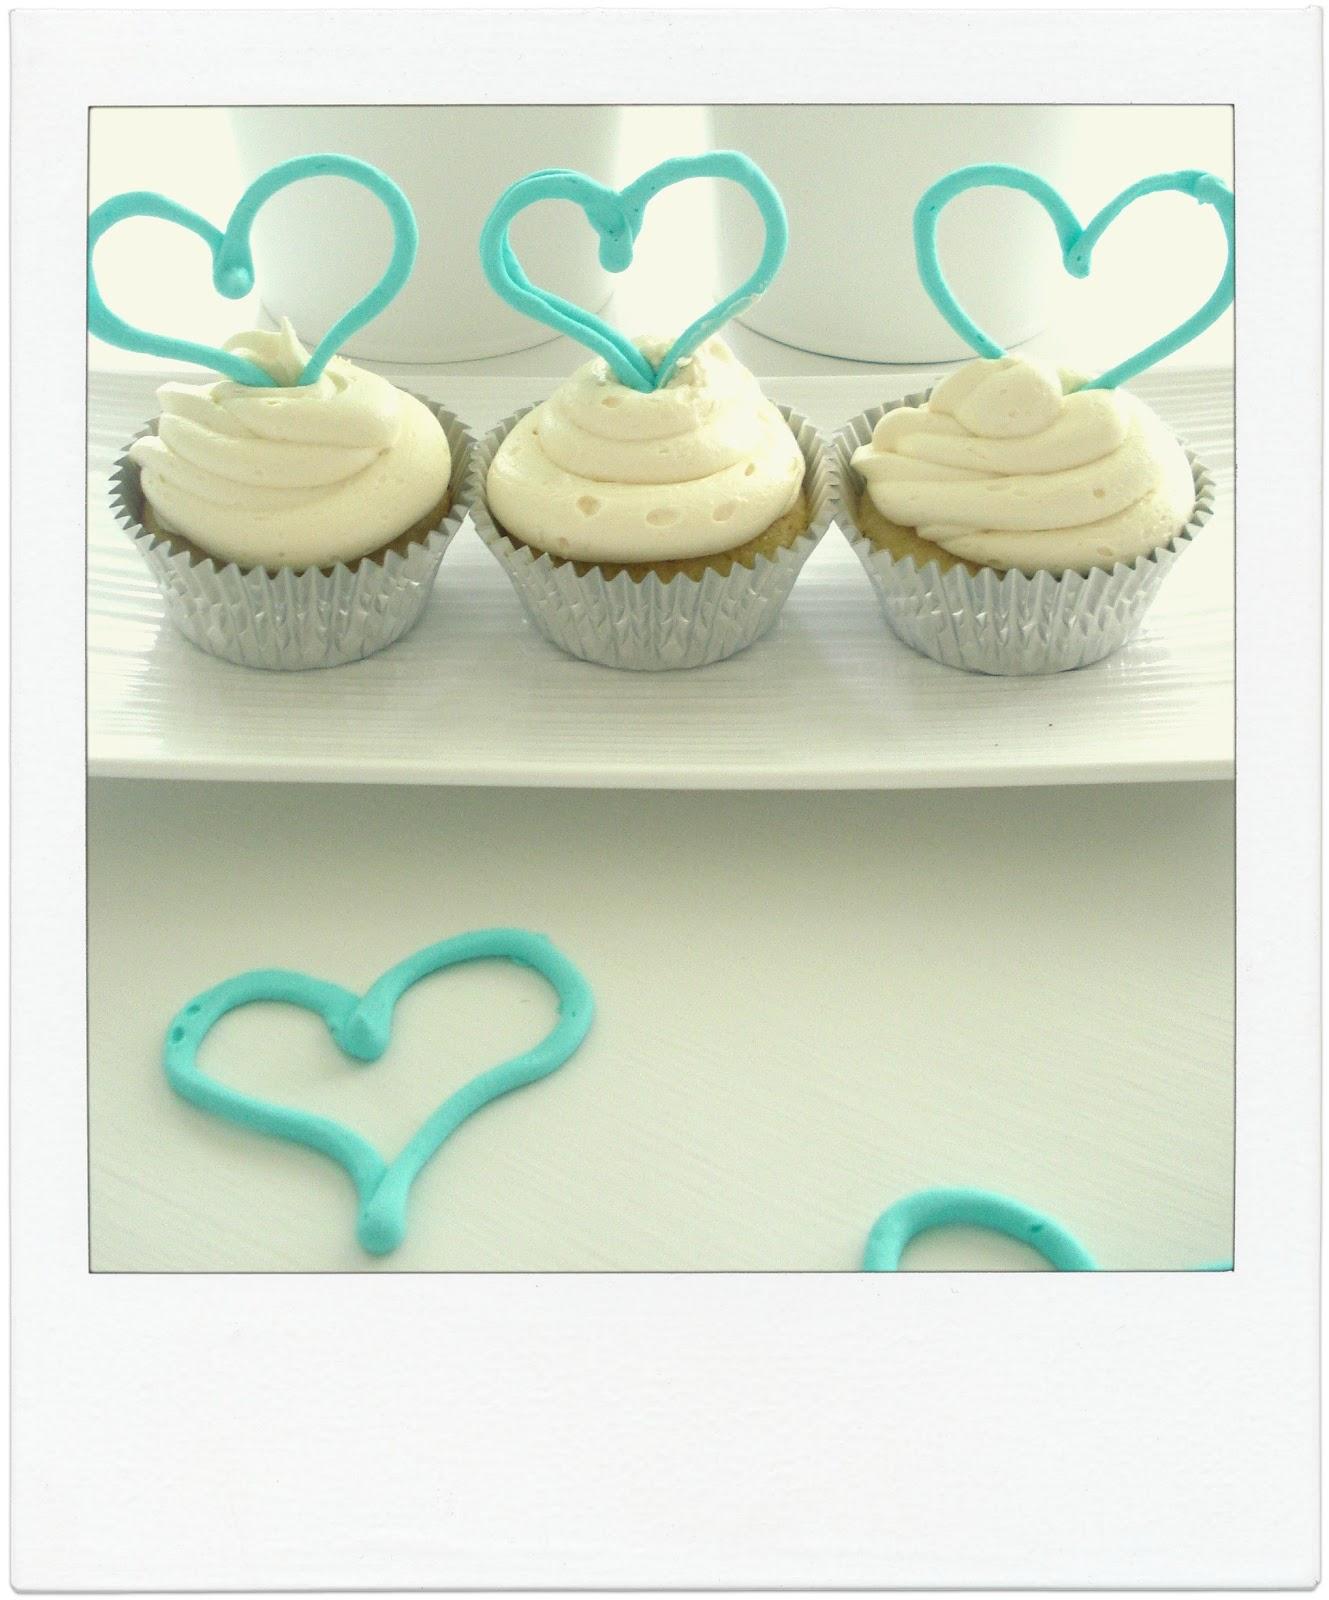 sweetpeaandivy: Cute Turquoise Heart Cupcakes